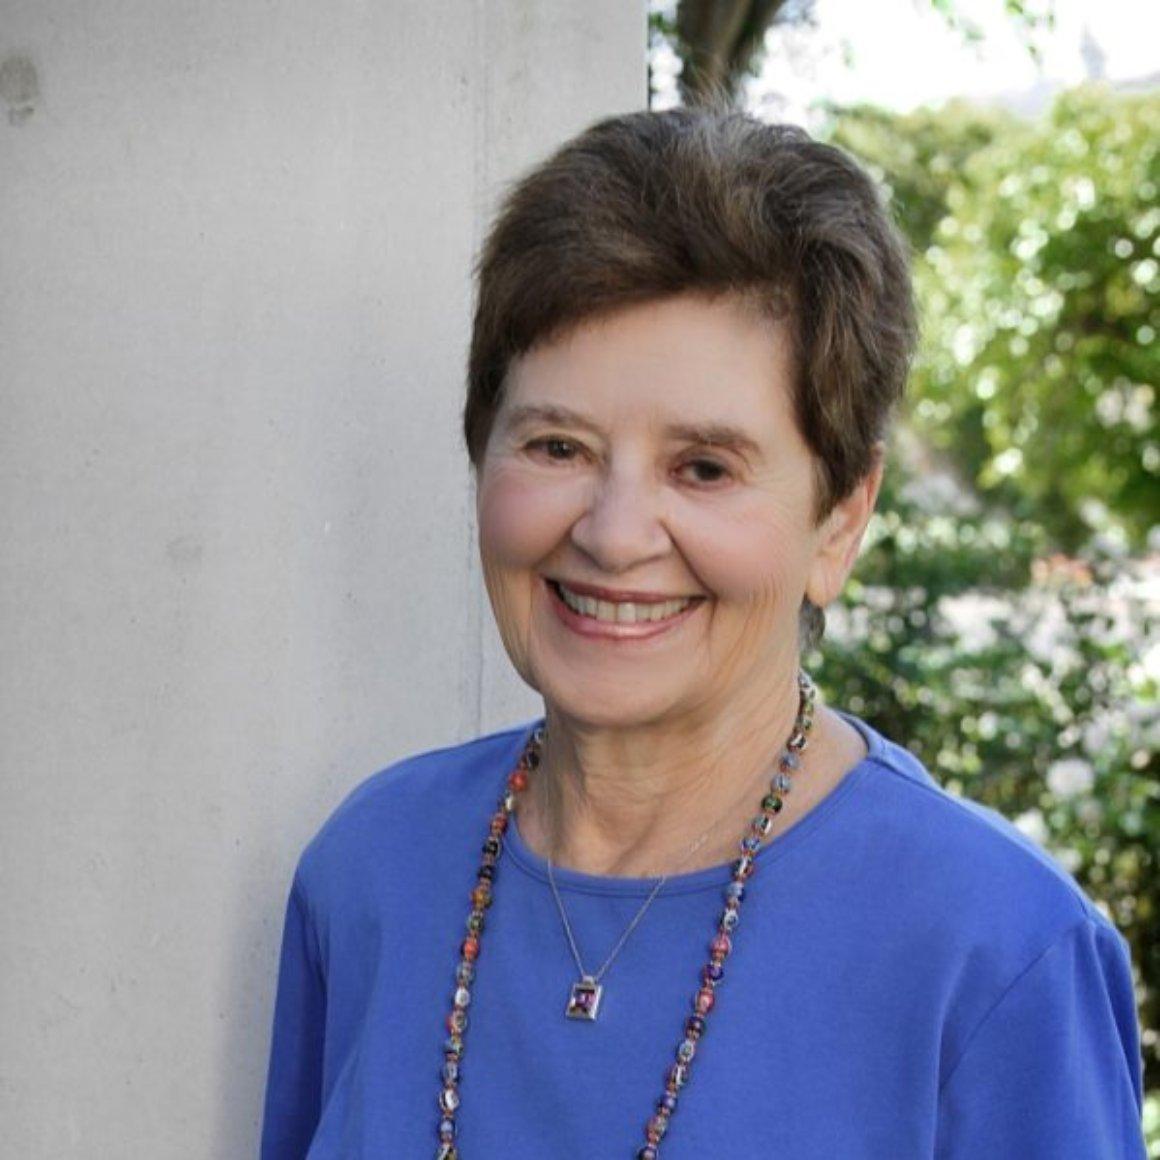 Carole Beeson-compressed doc